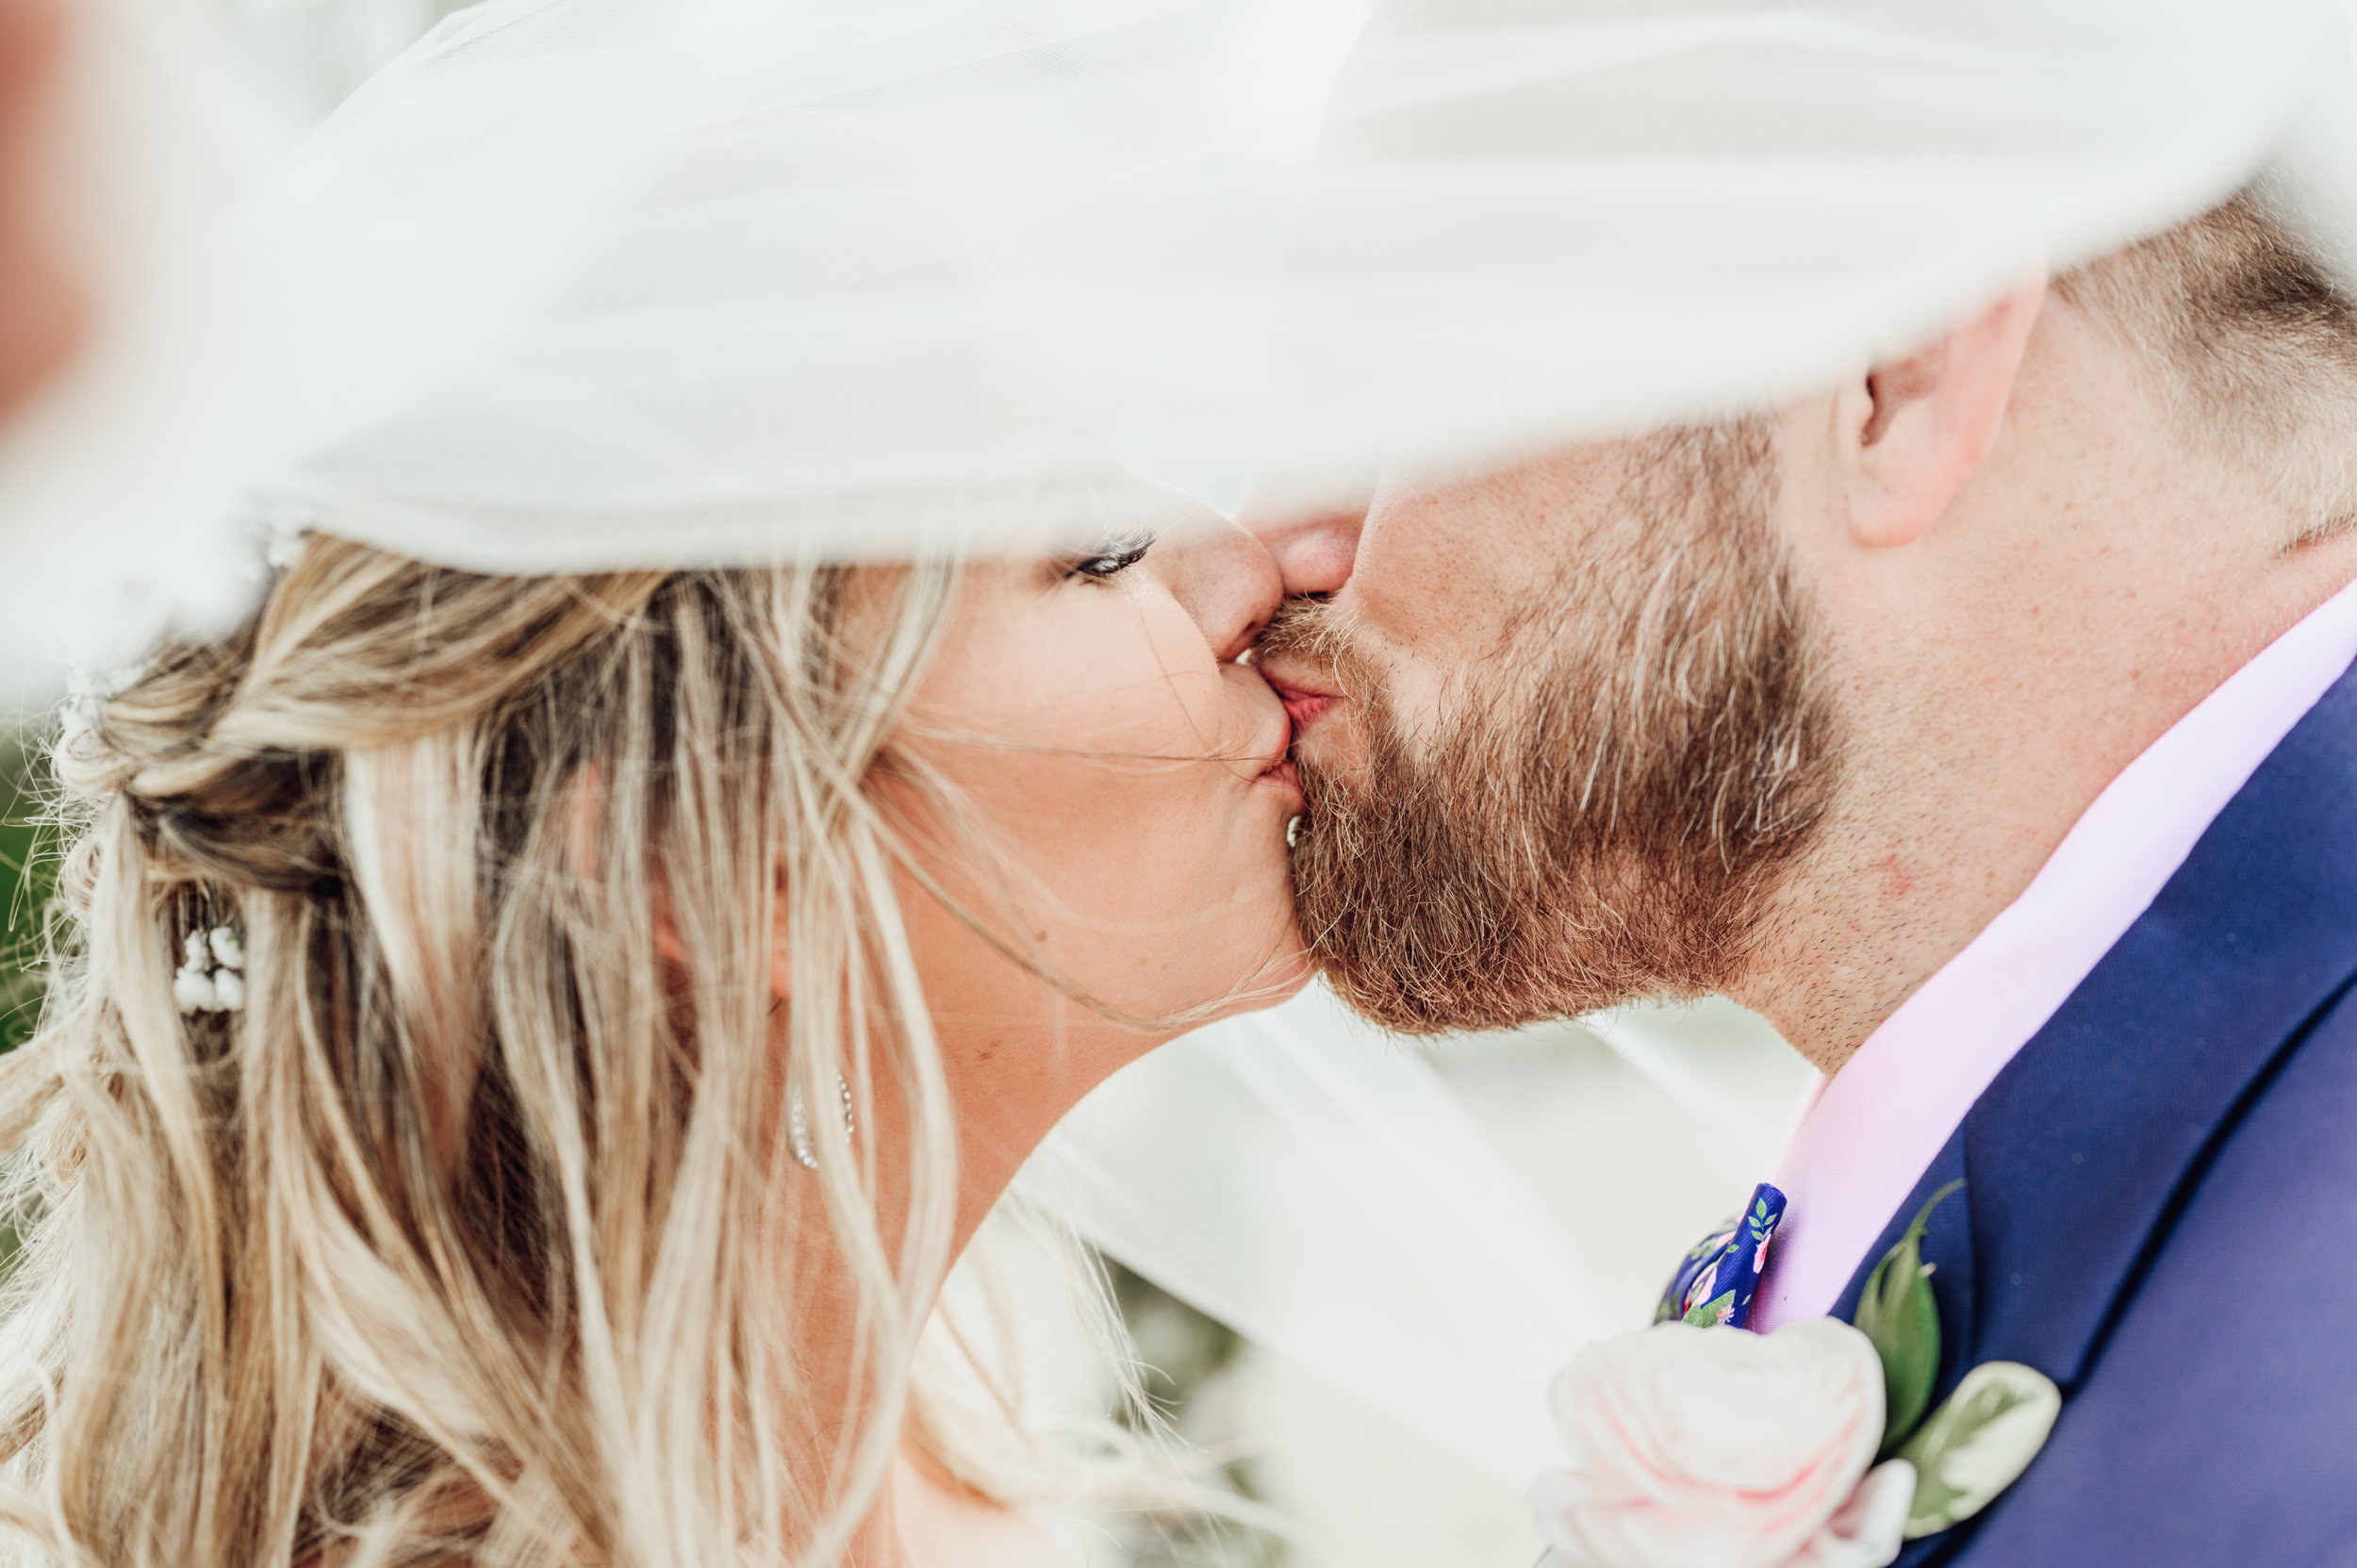 New Jersey Wedding Photographer, Felsberg Photography LBI wedding photography 84.jpg